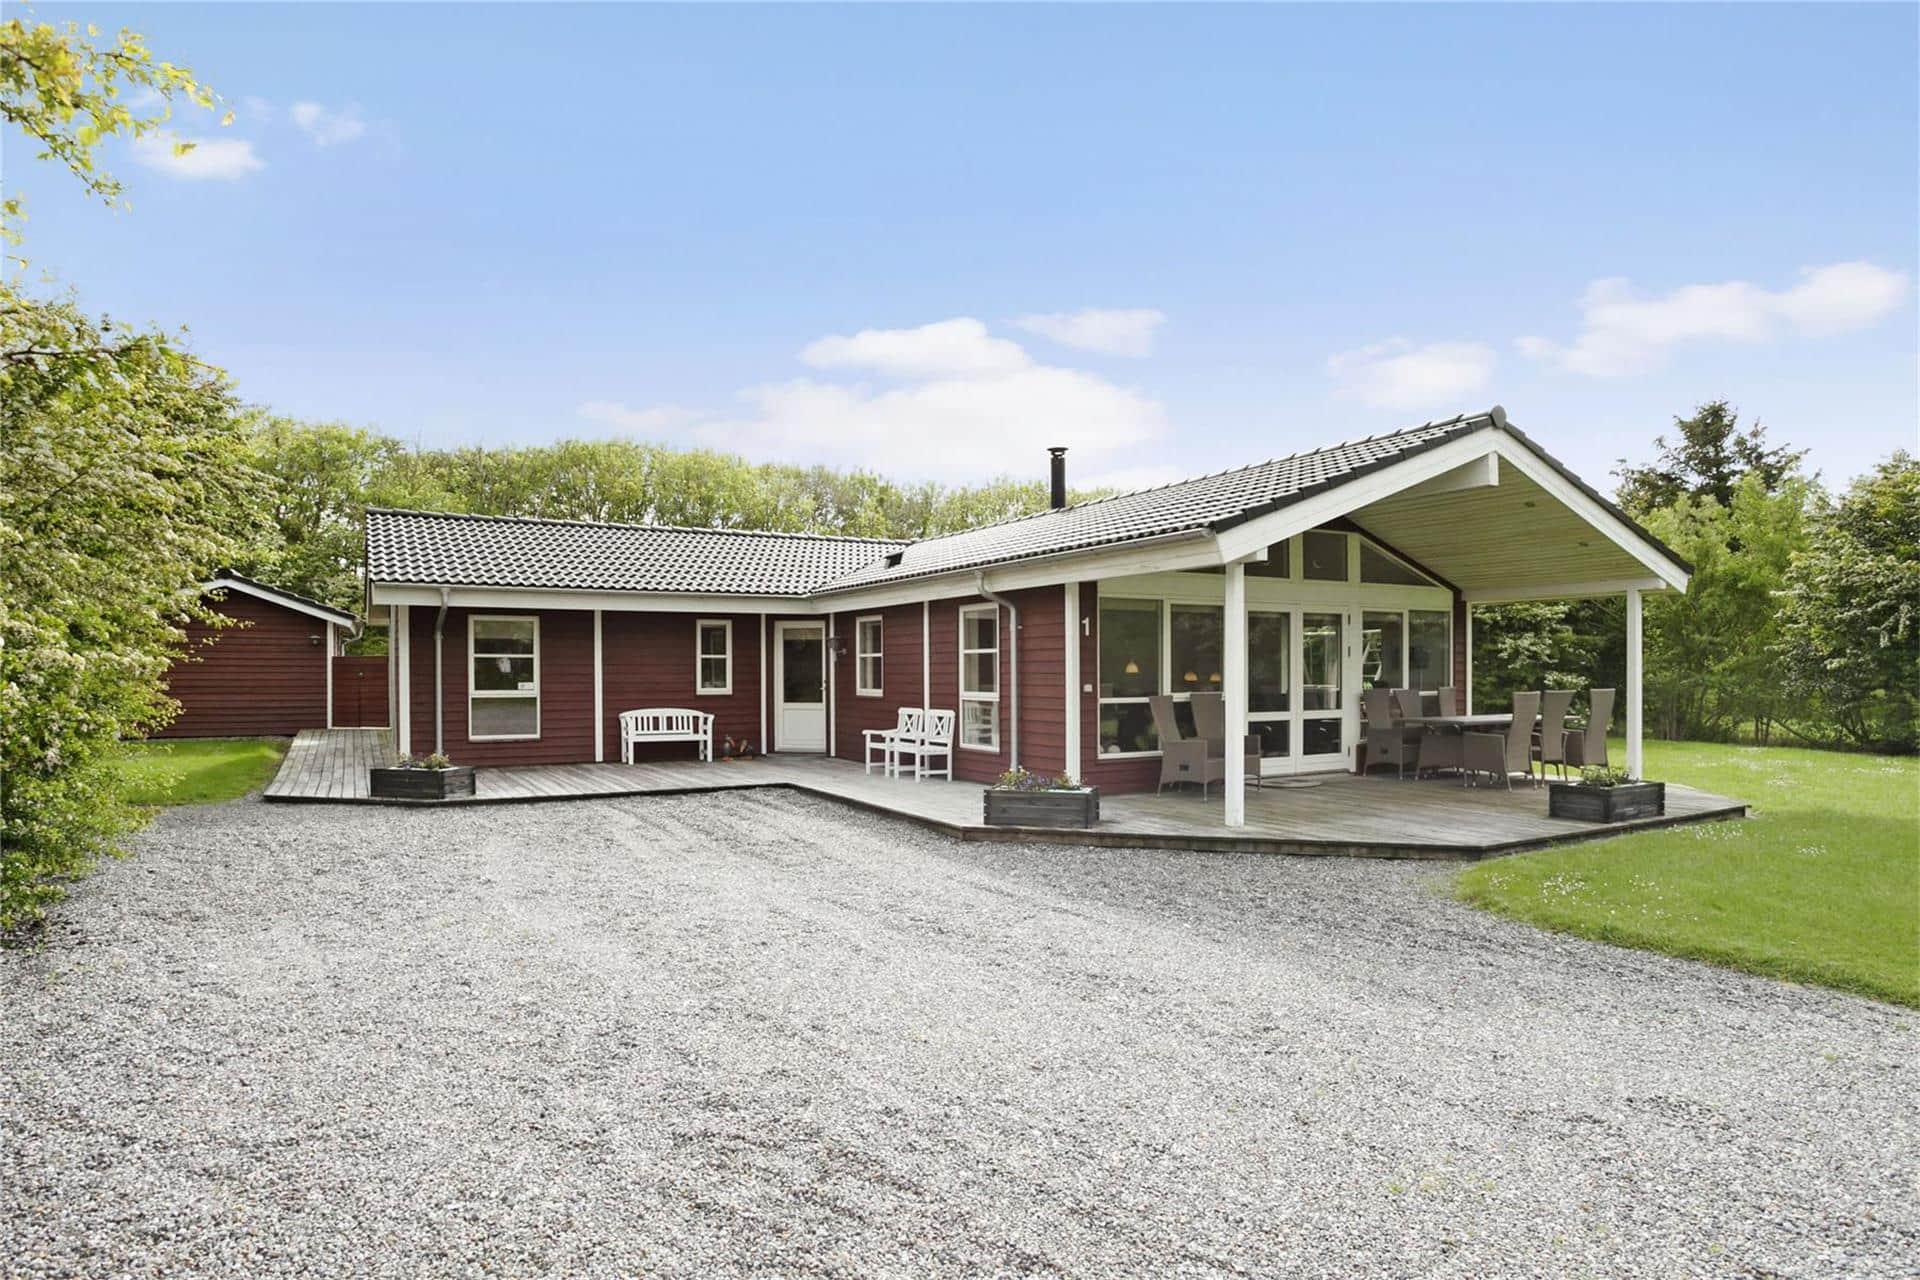 Bild 1-13 Ferienhaus 509, Ingeborgs Alle 1, DK - 7770 Vestervig